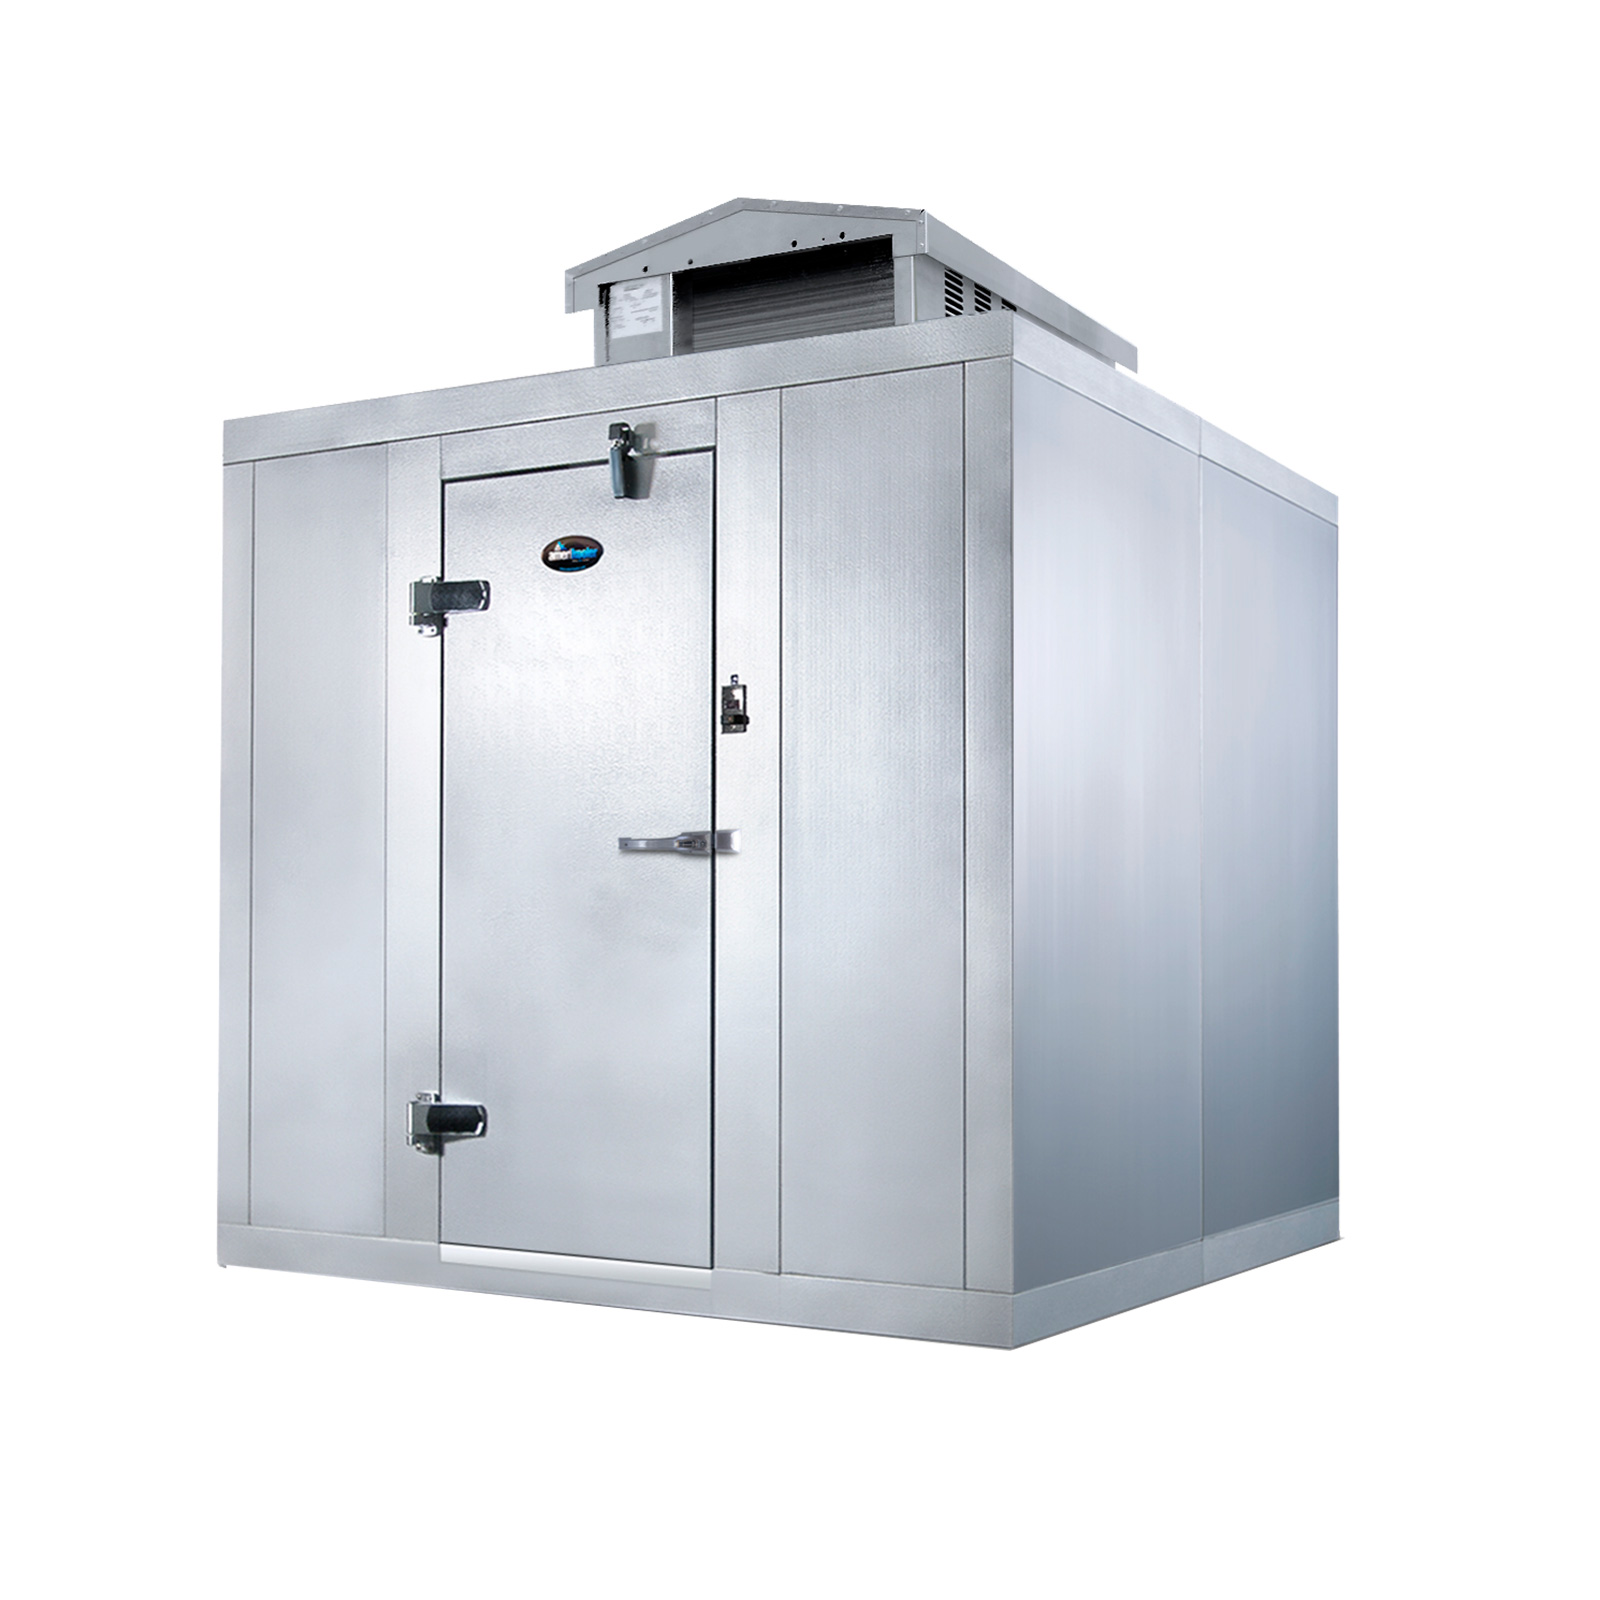 AmeriKooler DC080872**NBSC-O walk in cooler, modular, self-contained